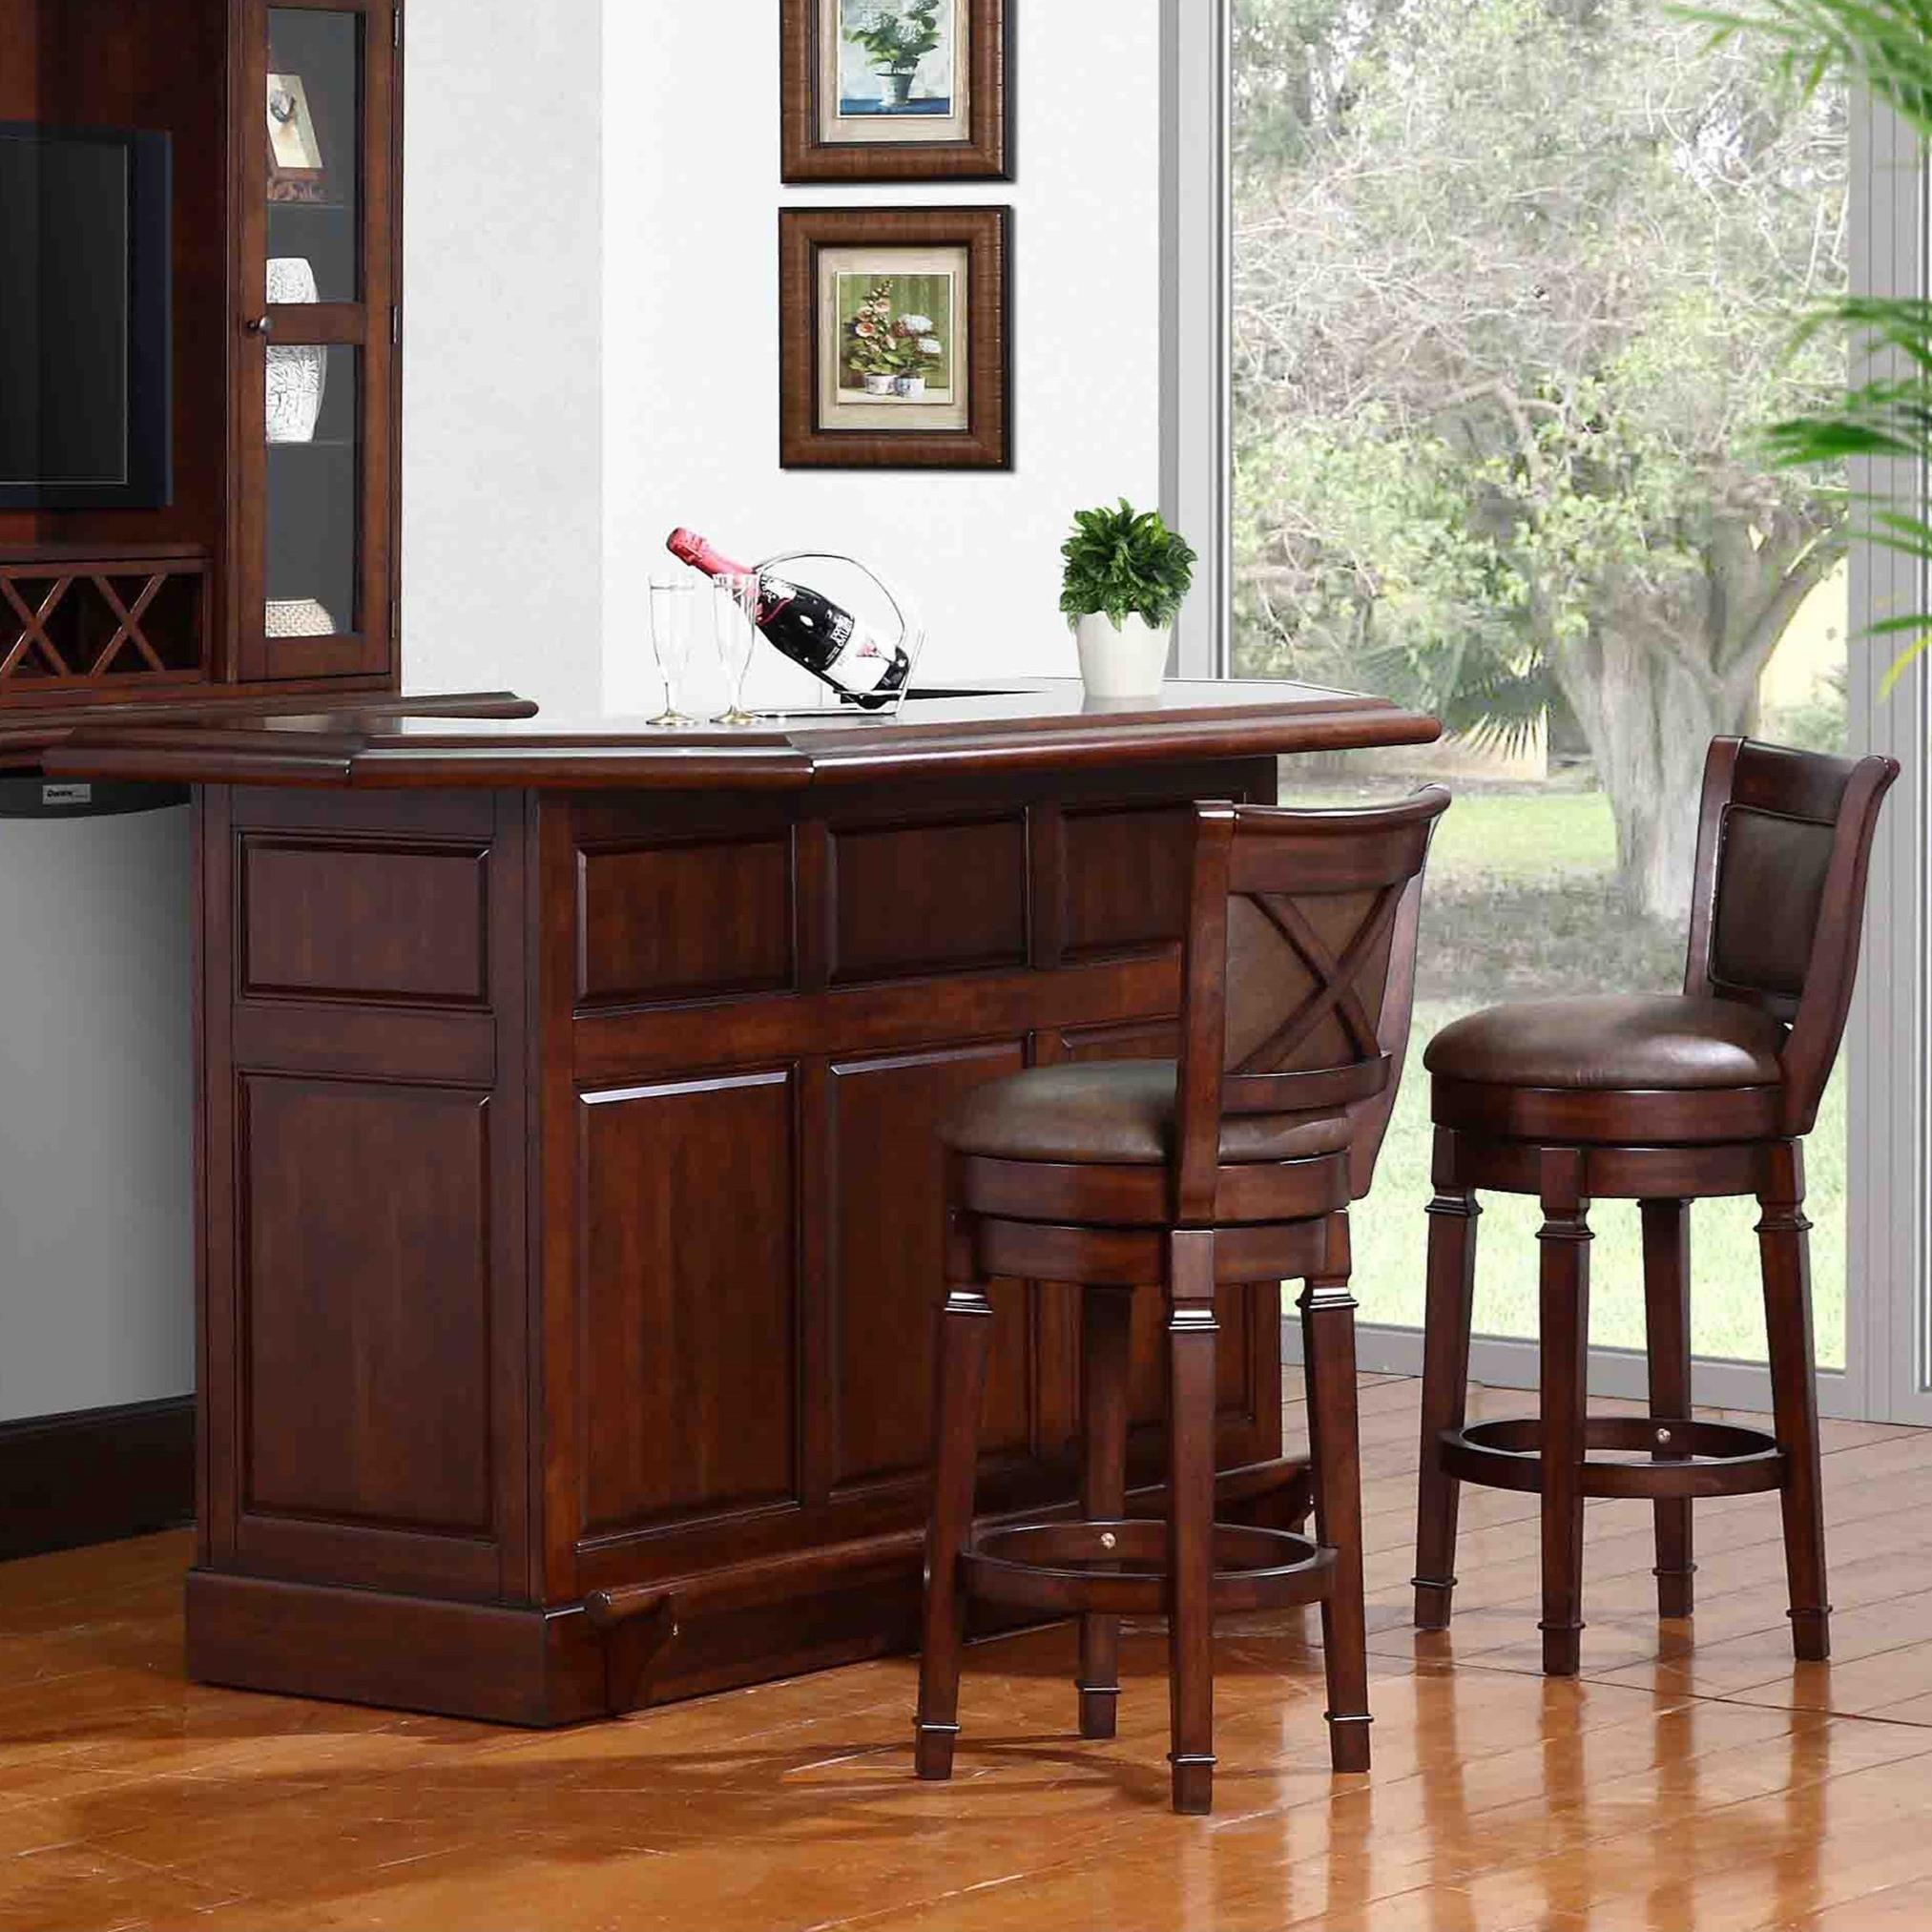 Delicieux E.C.I. Furniture Belvedere 0411 Bar Set With Stools